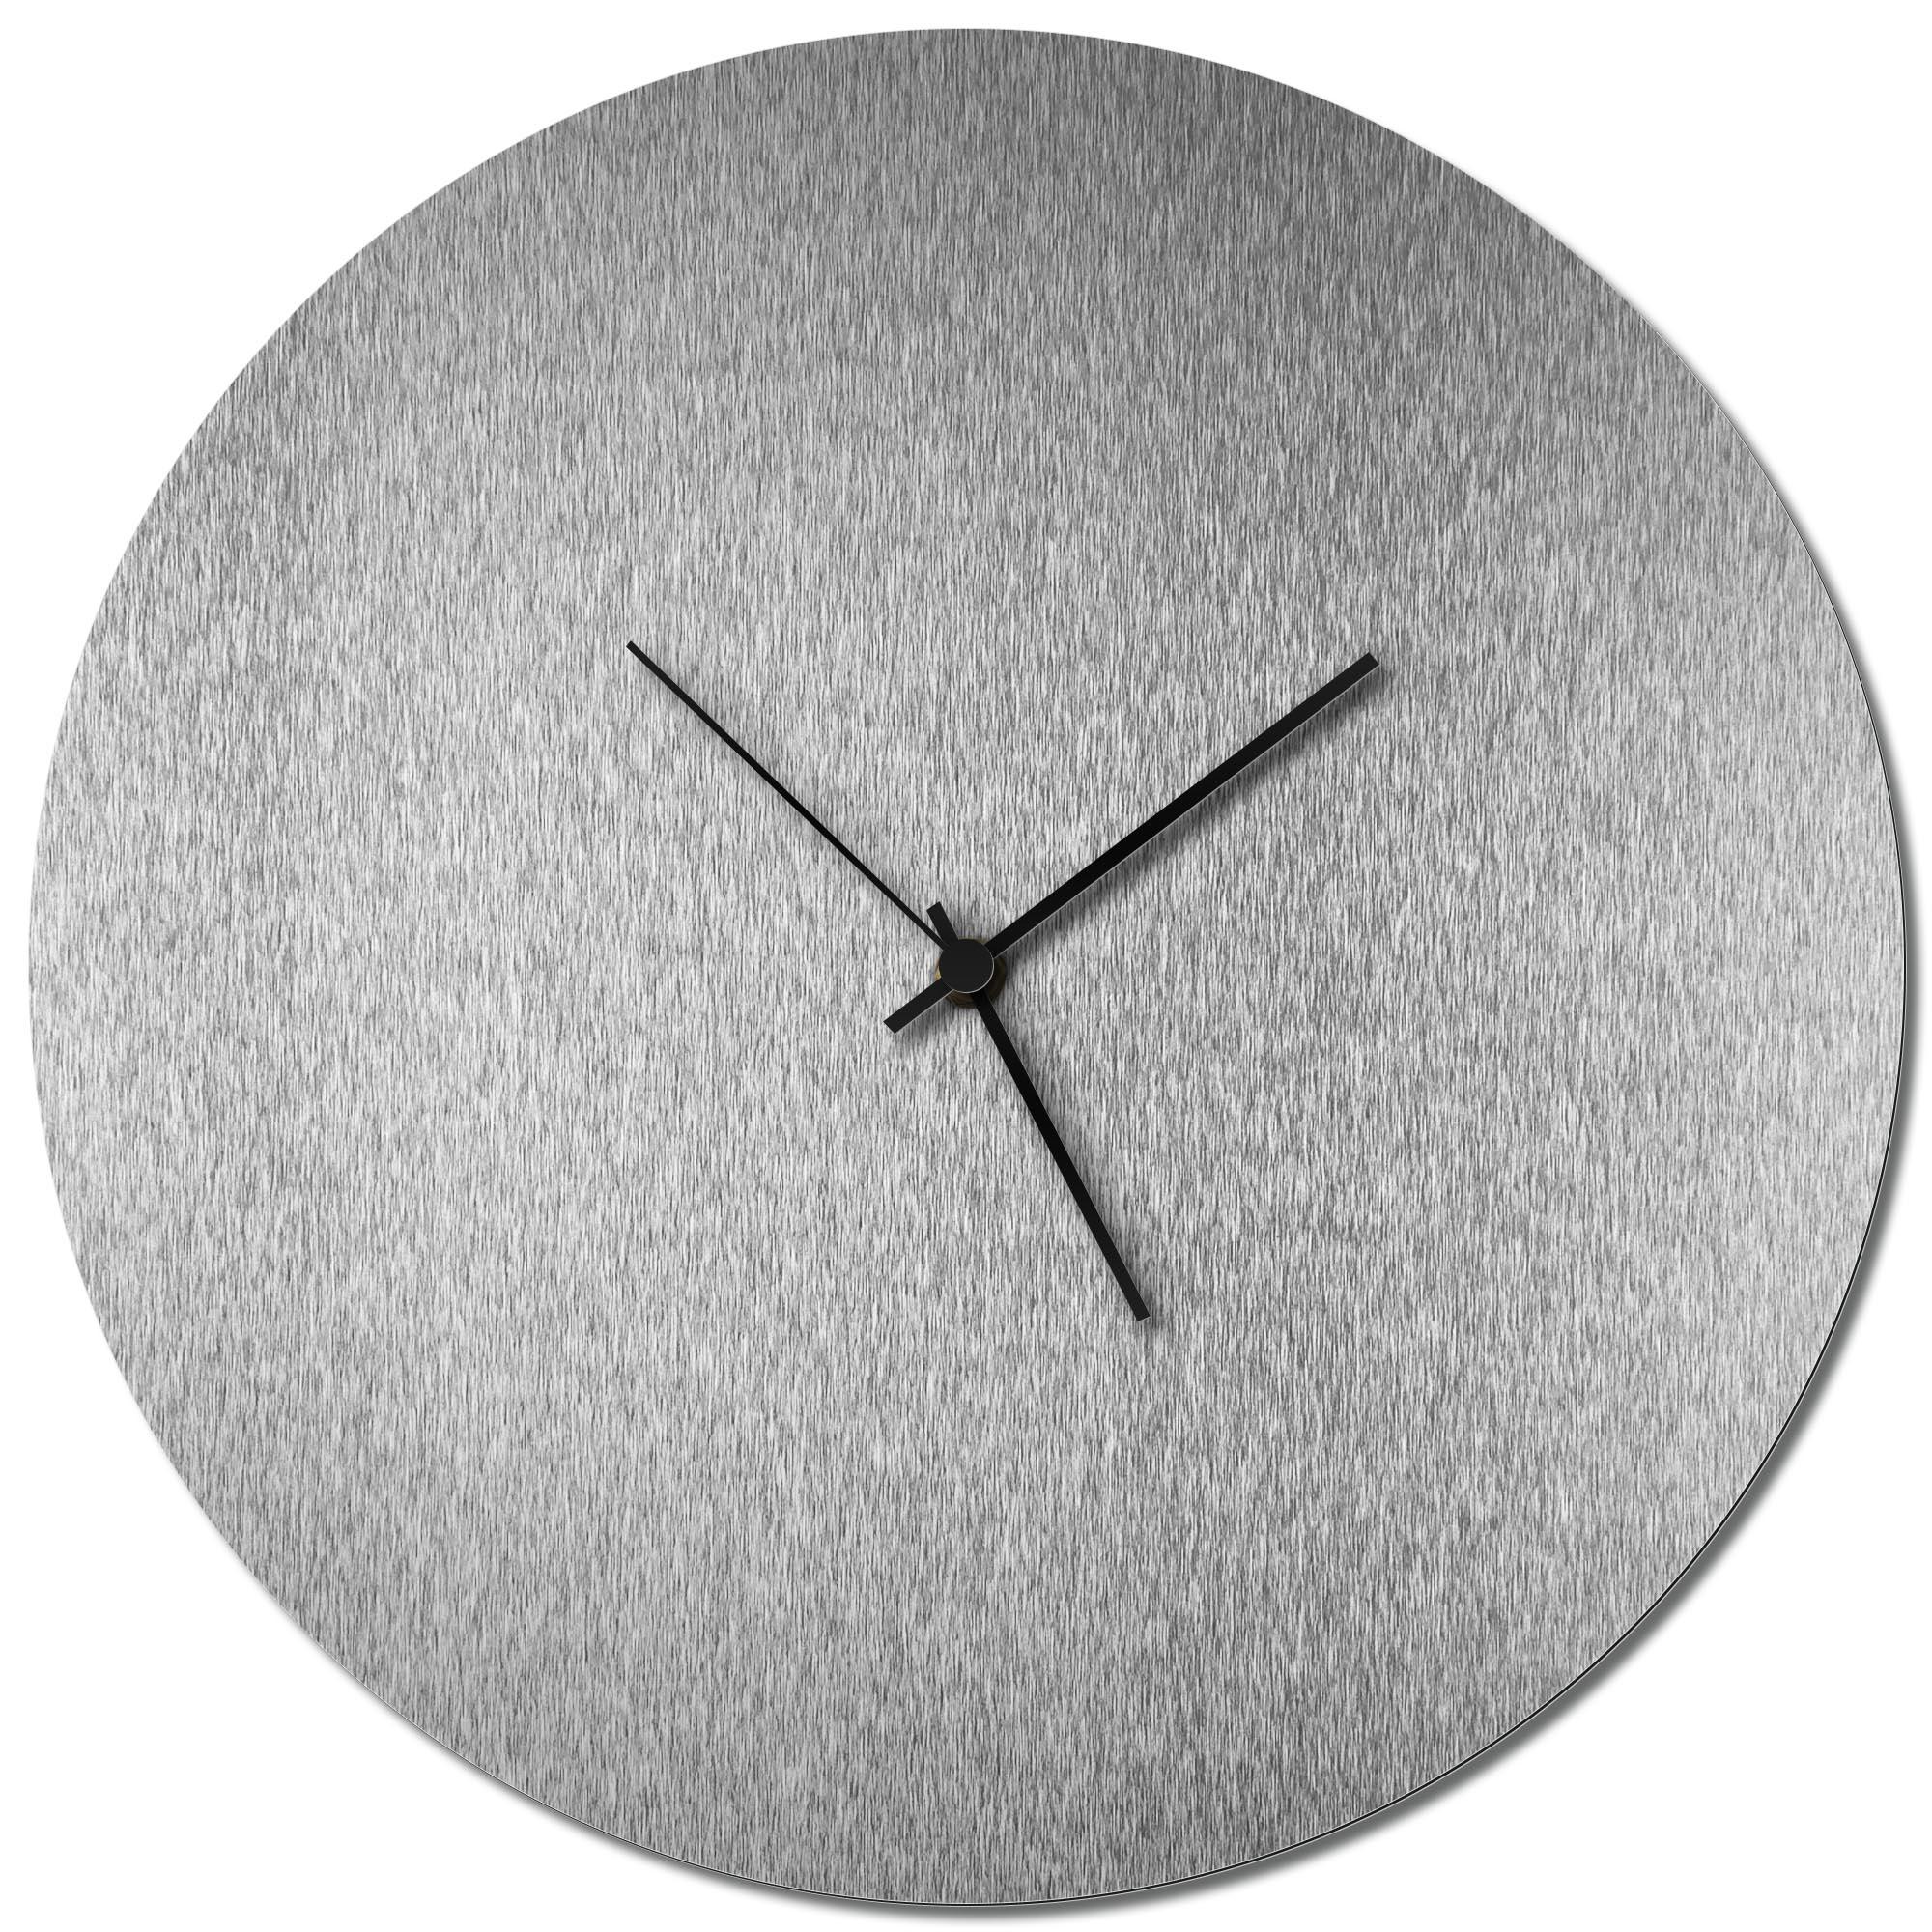 Adam Schwoeppe 'Silversmith Circle Clock Large Black' Midcentury Modern Style Wall Clock